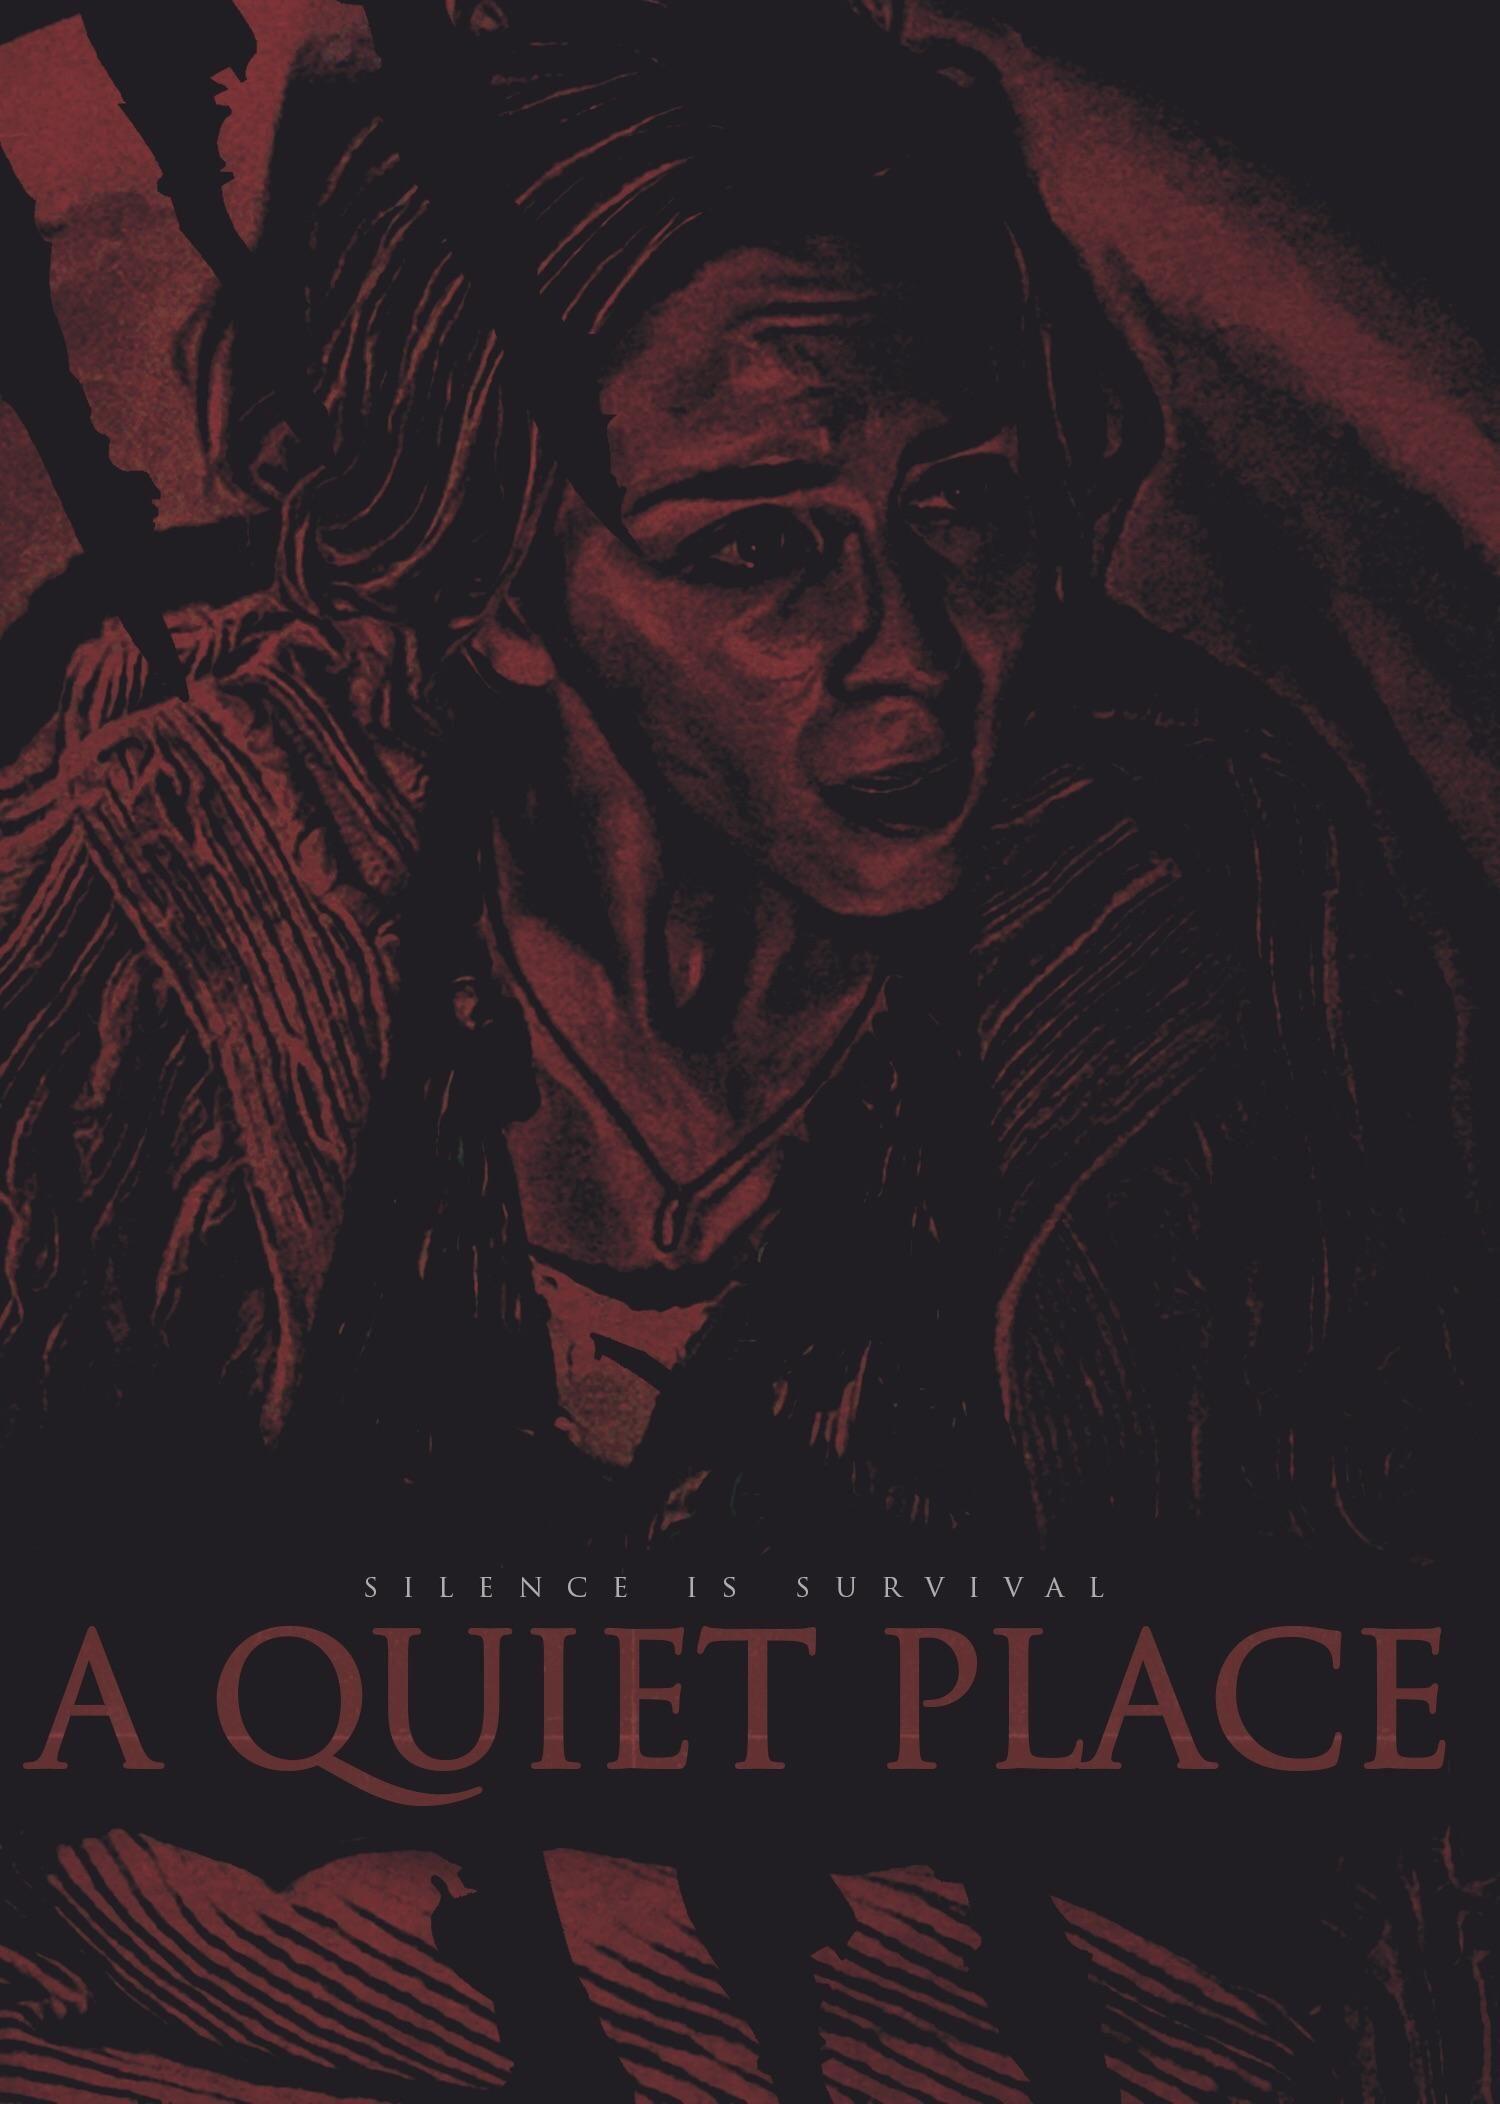 A Quiet Place 2018 1500x2104 A Quiet Place Movie Horror Movie Posters Movie Artwork